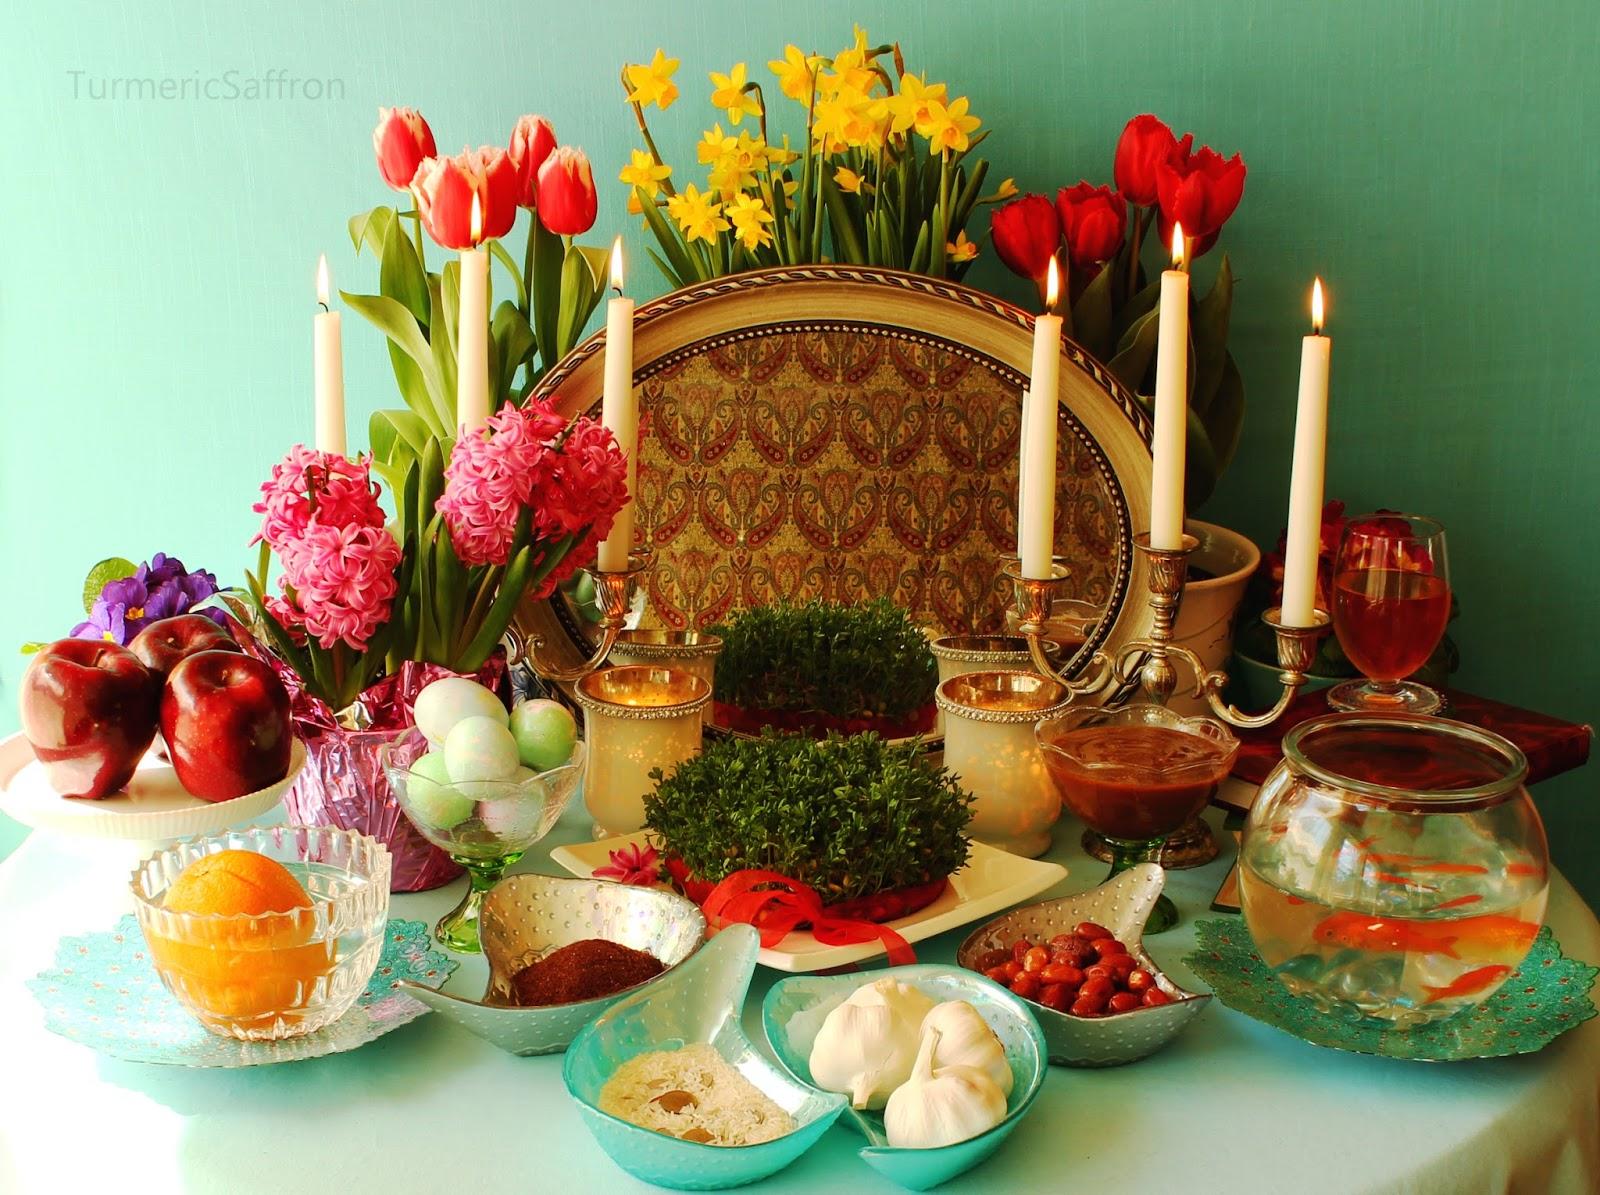 Turmeric & Saffron: Haft Seen Photos - Nowruz 2014 Persian Haft Seen